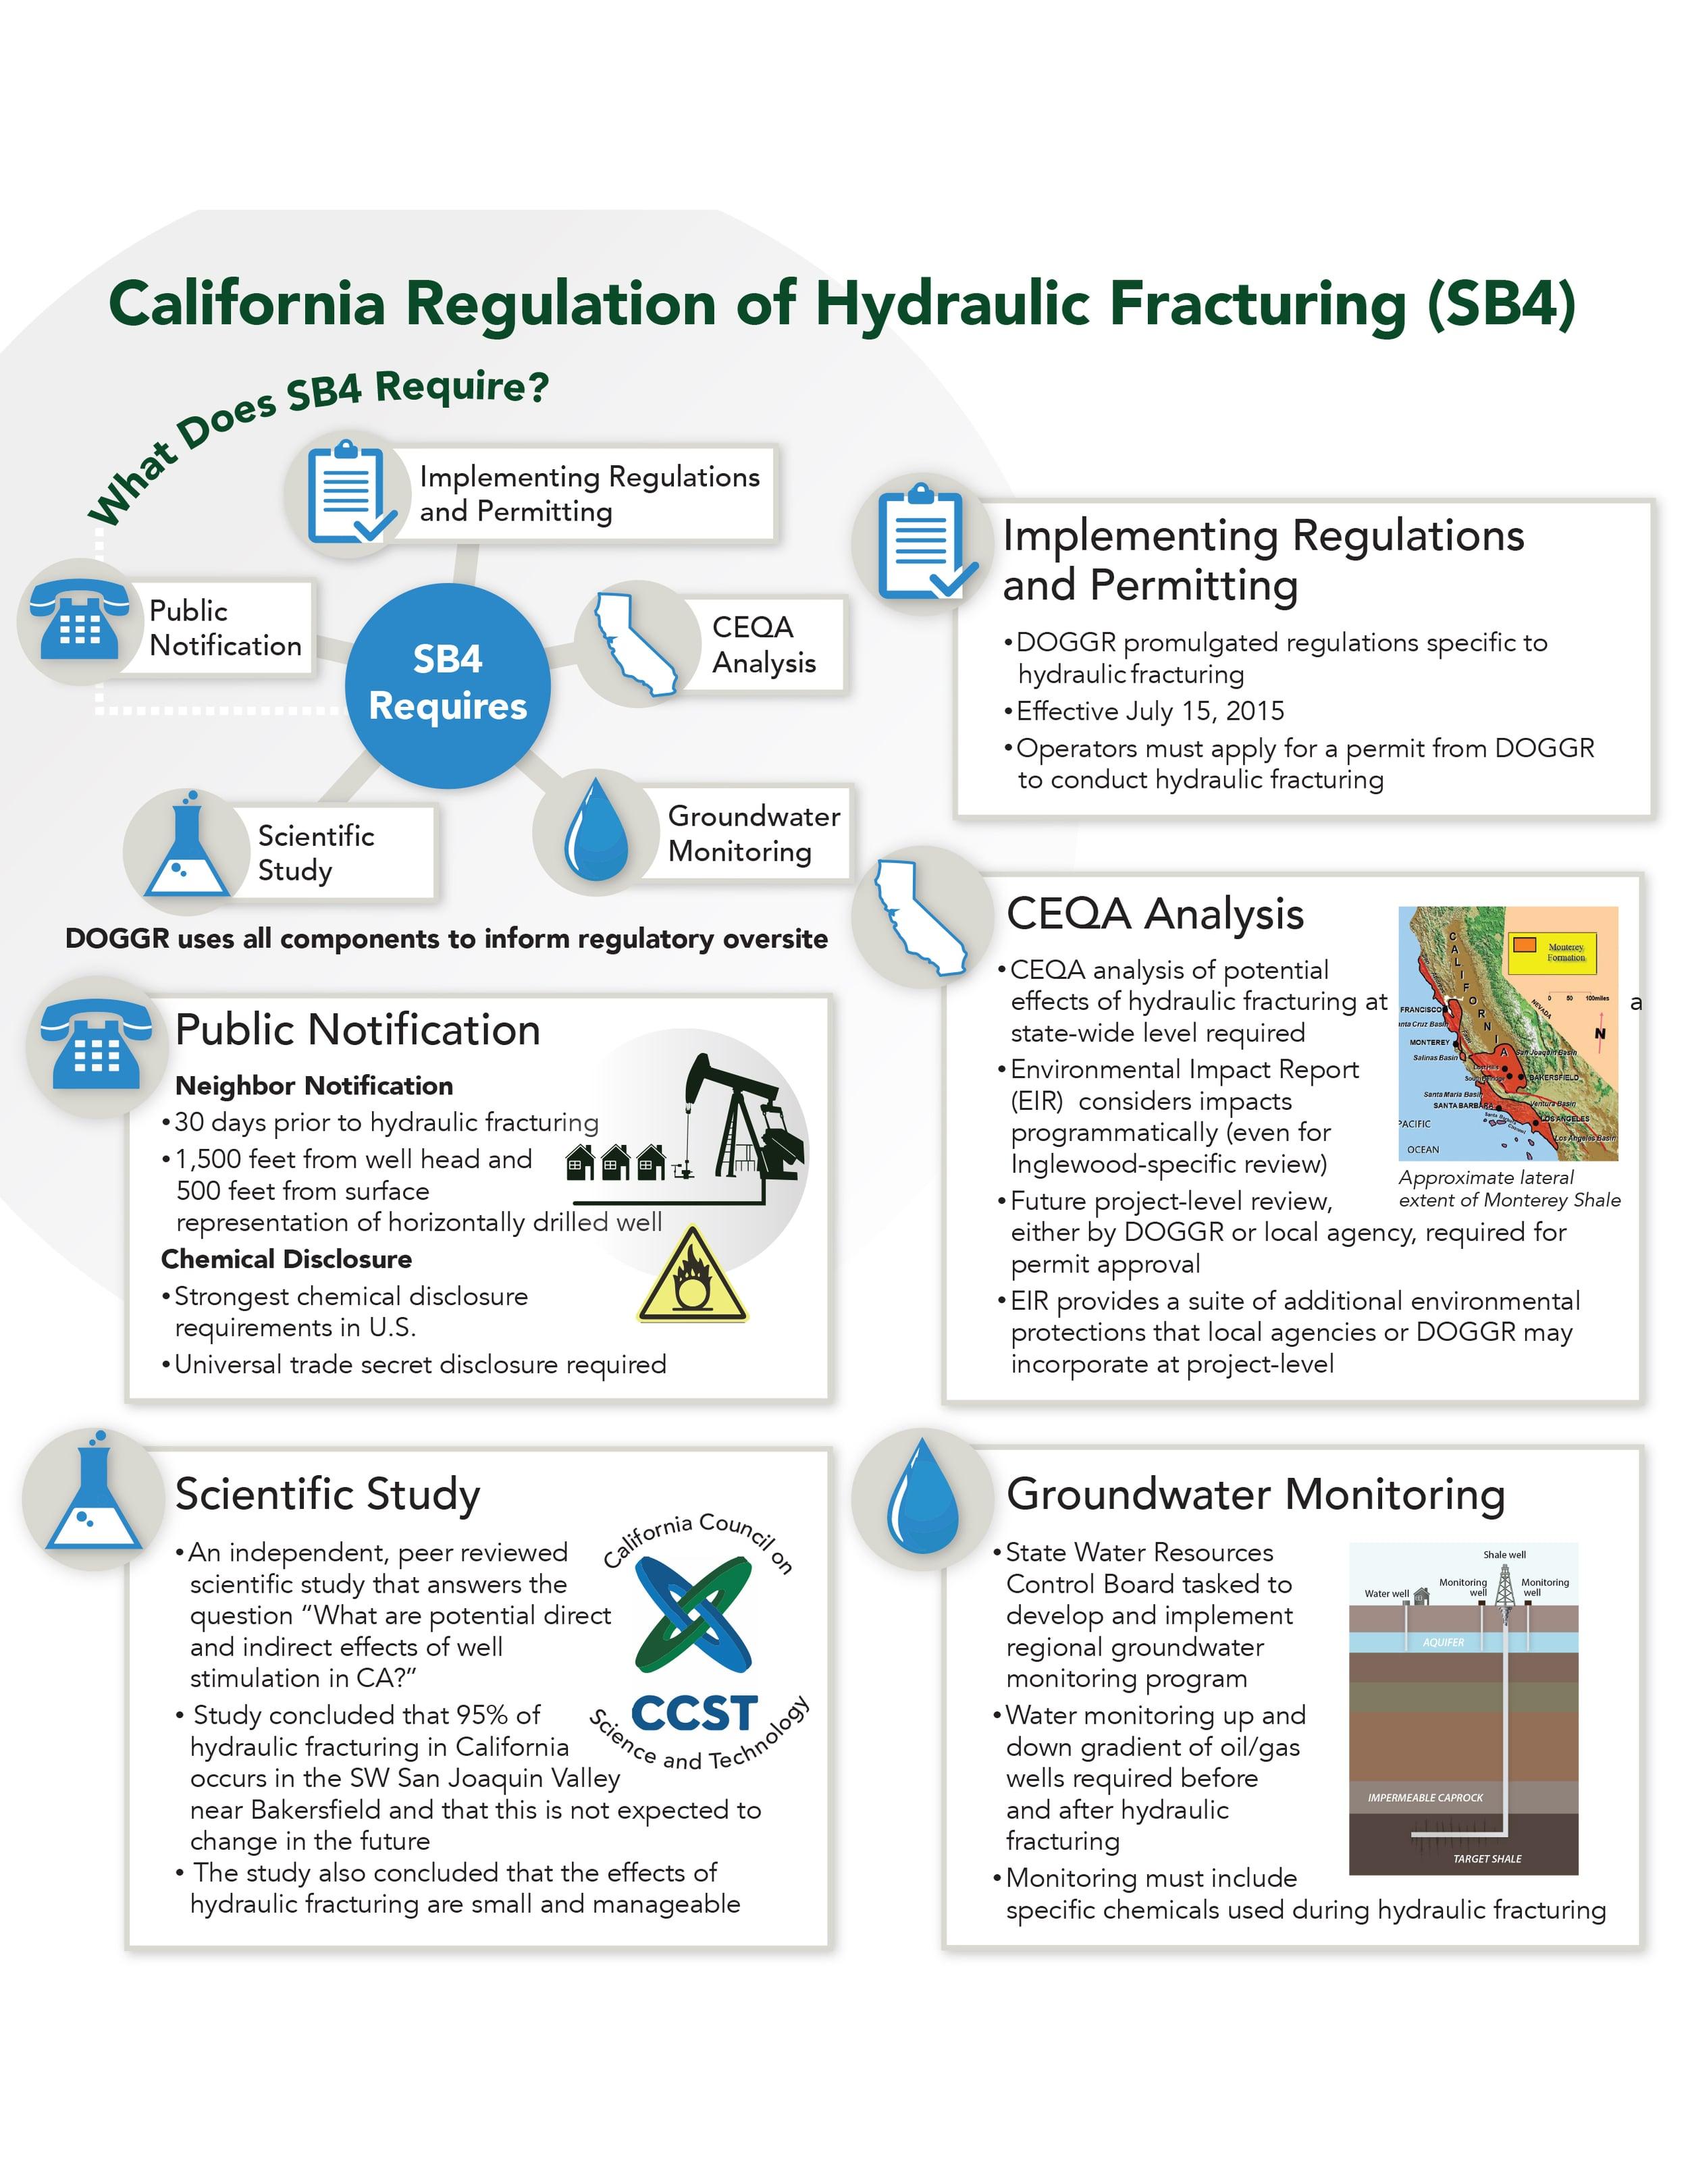 California regulation of hydraulic fracturing (sb4)